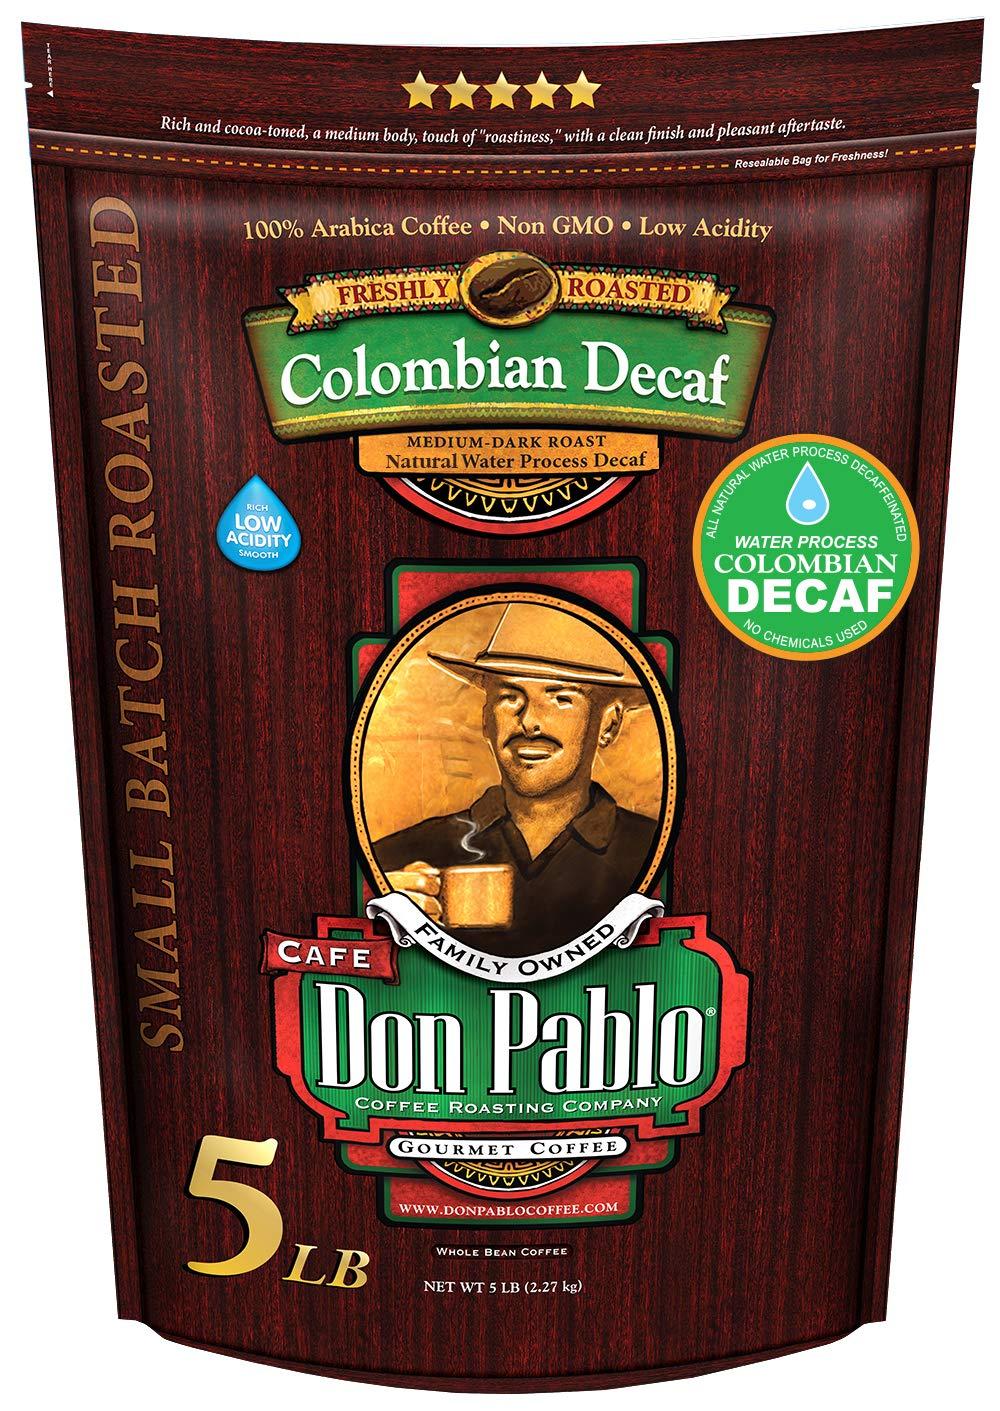 5LB Cafe Don Pablo Decaf Swiss Water Process Colombian Gourmet Coffee Decaffeinated - Medium-Dark Roast - Whole Bean Coffee - 5 Pound ( 5 lb ) Bag